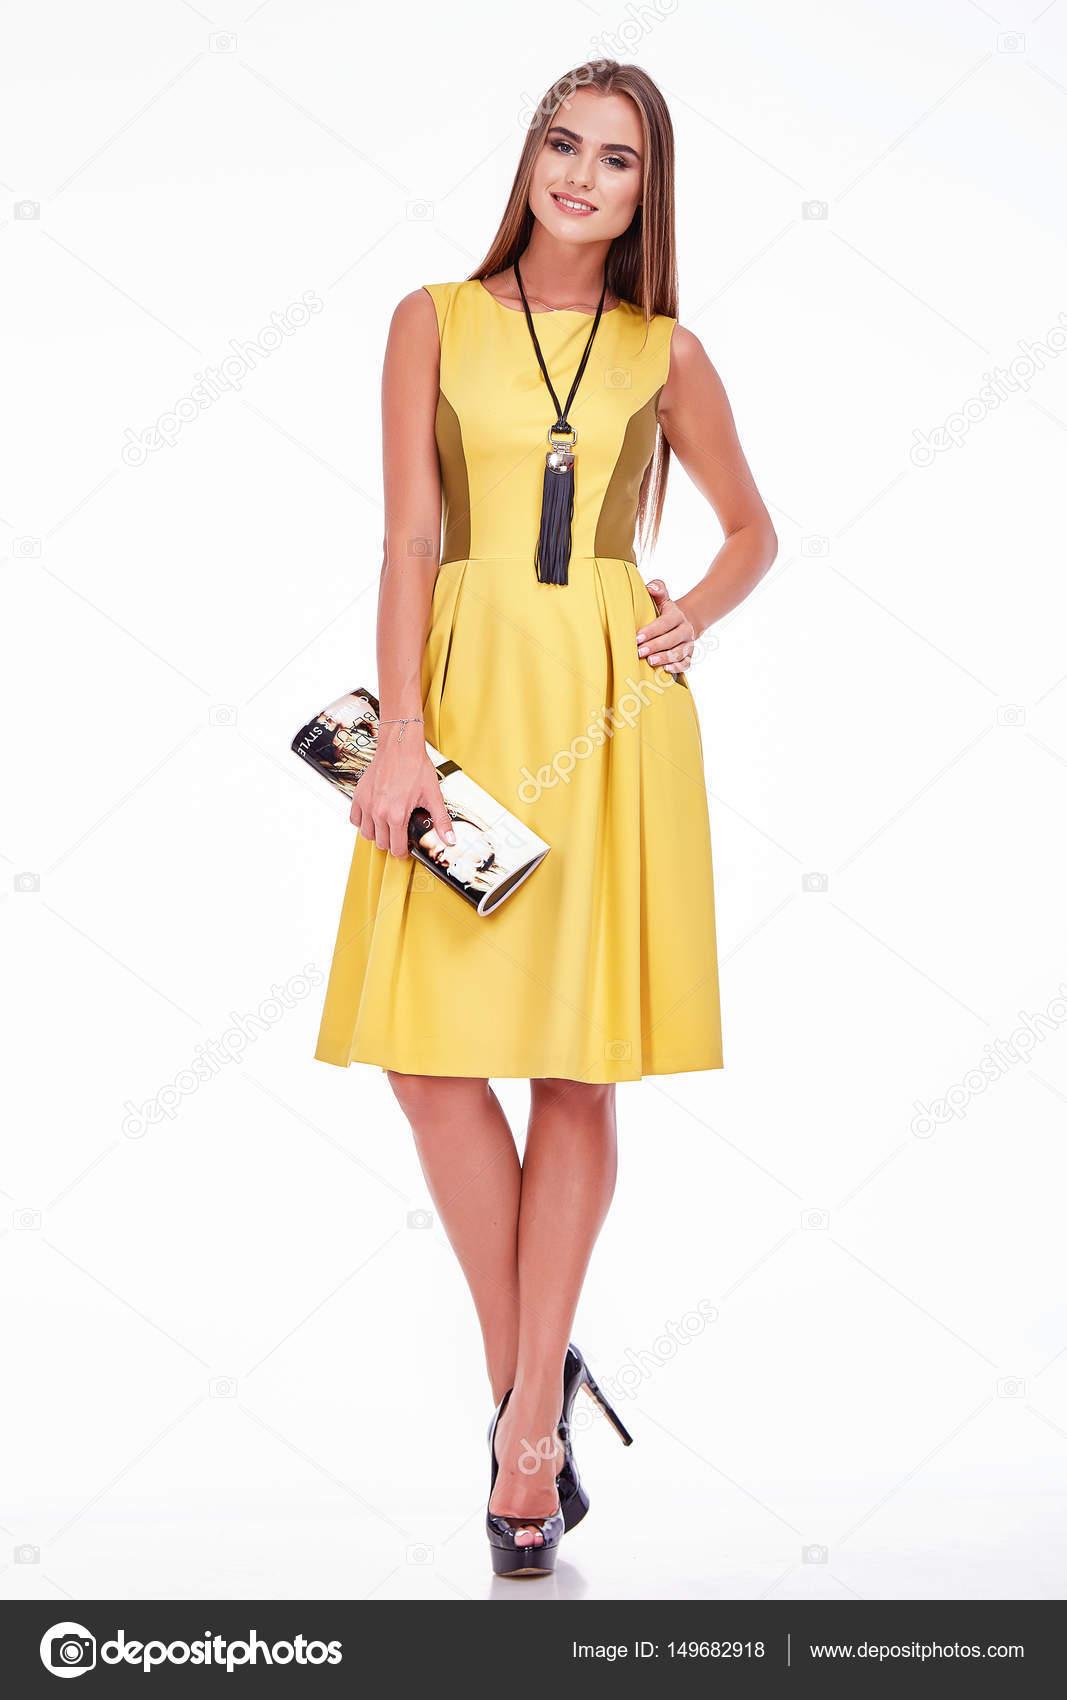 b4f702bf617f7 Belle femme sexy joli visage maquillage wear fashion style tissu ...